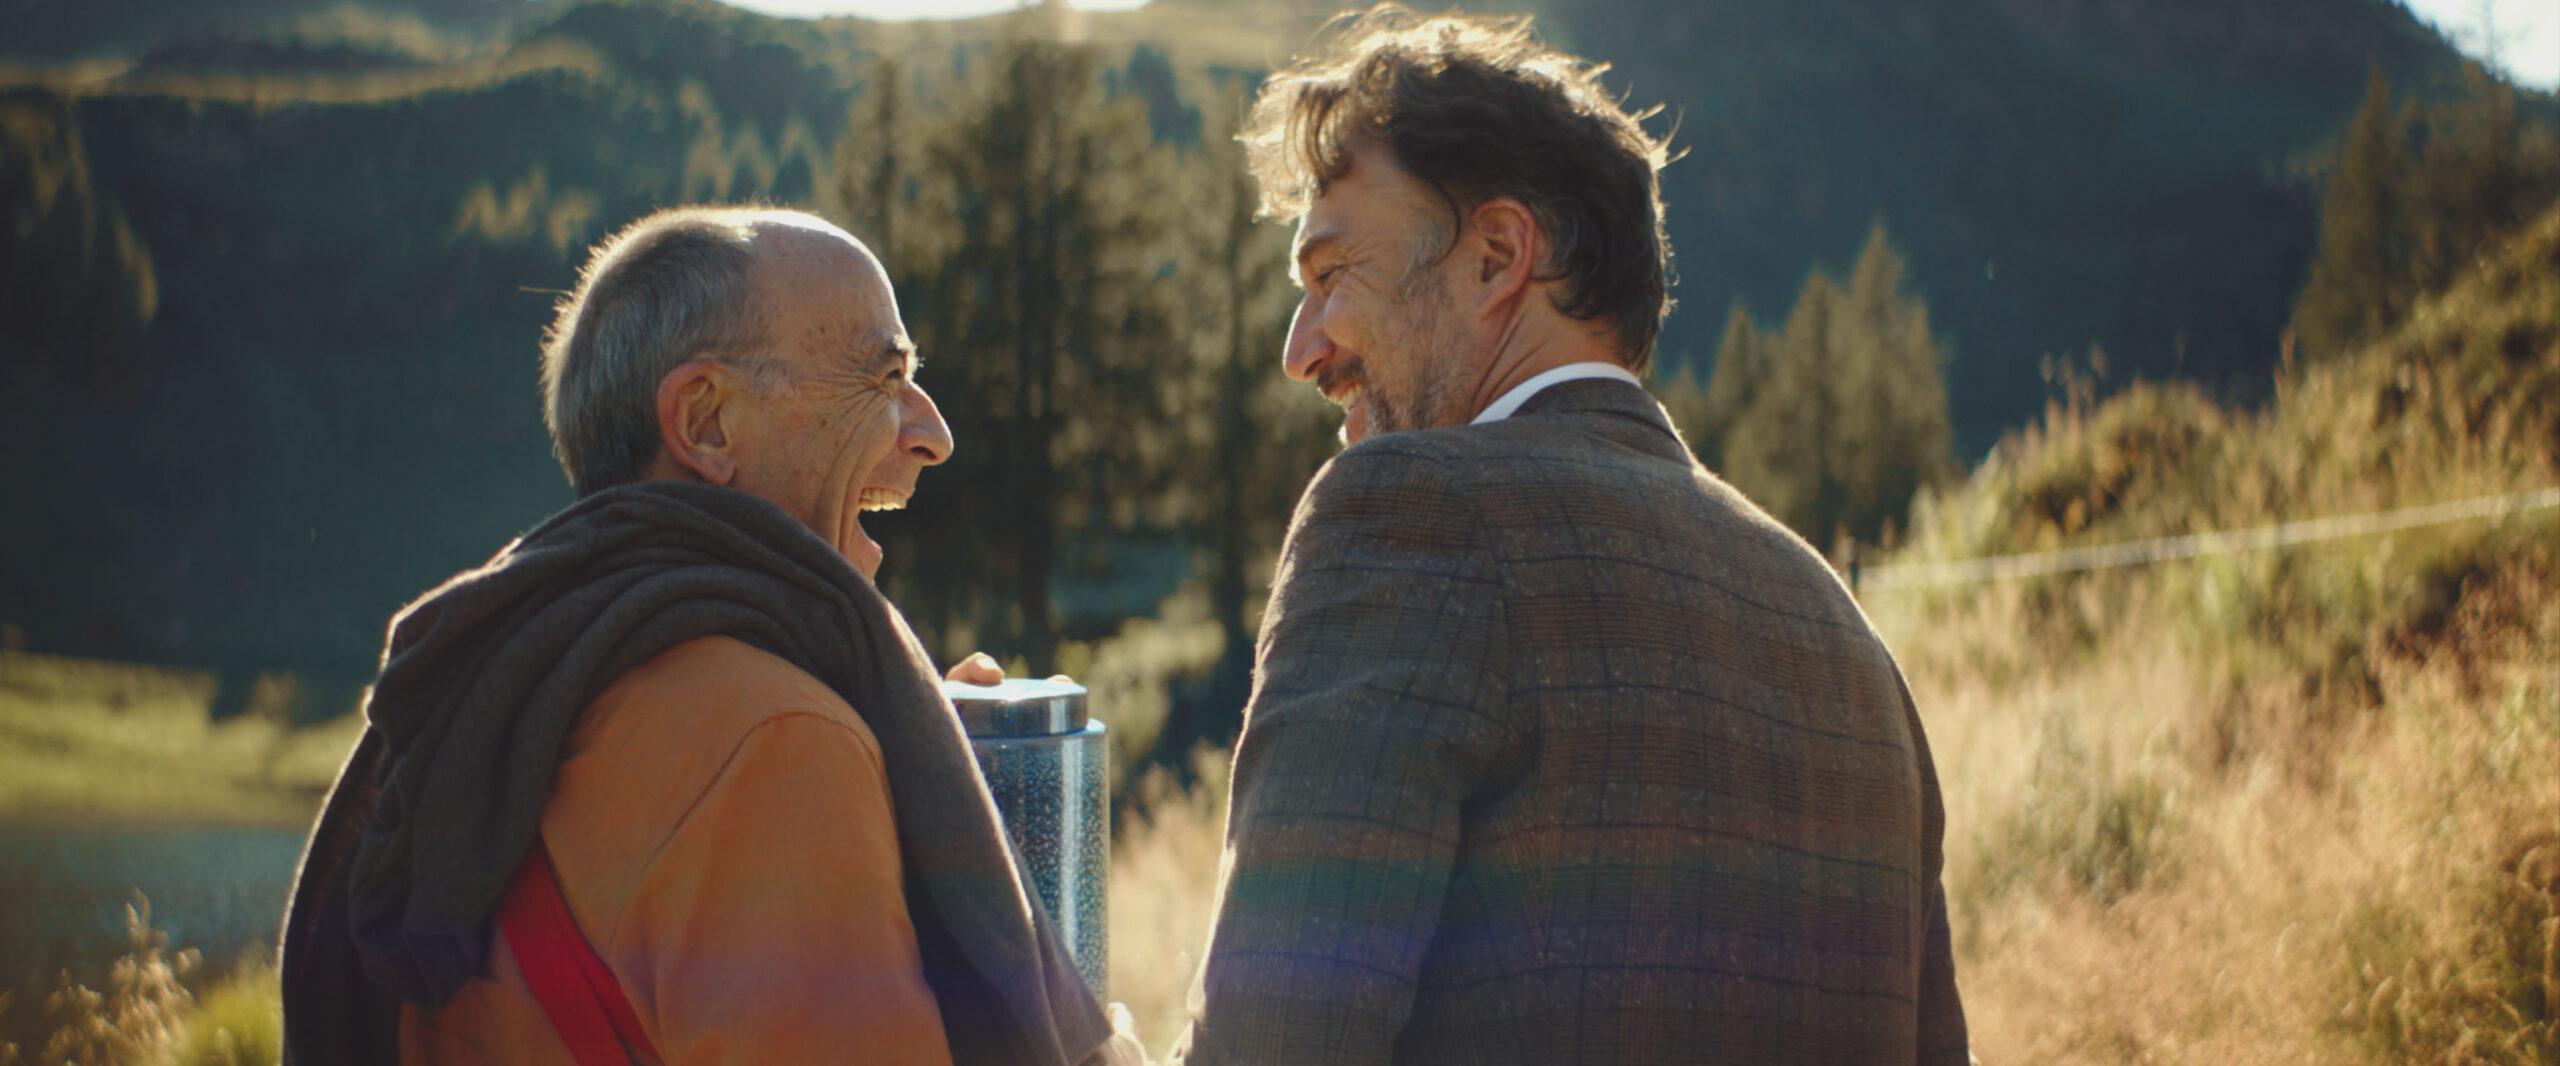 Carlos Leal and Peter Fischli joyfully walking through nature